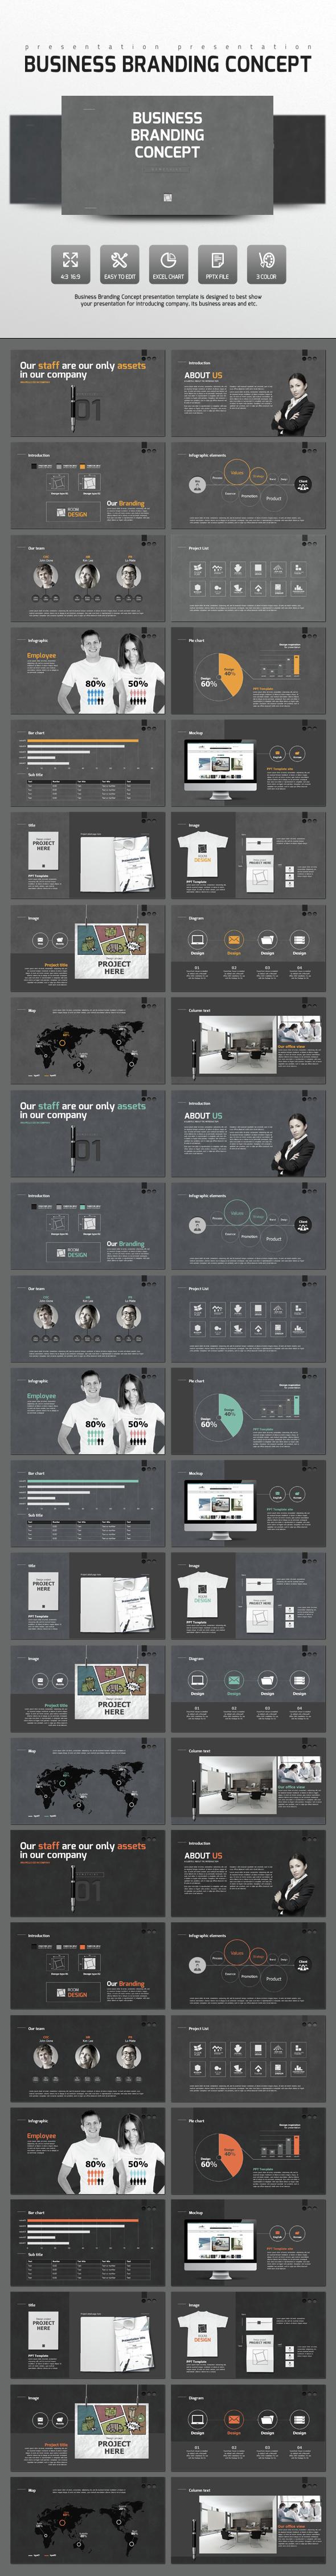 Business Branding Concept - Business PowerPoint Templates